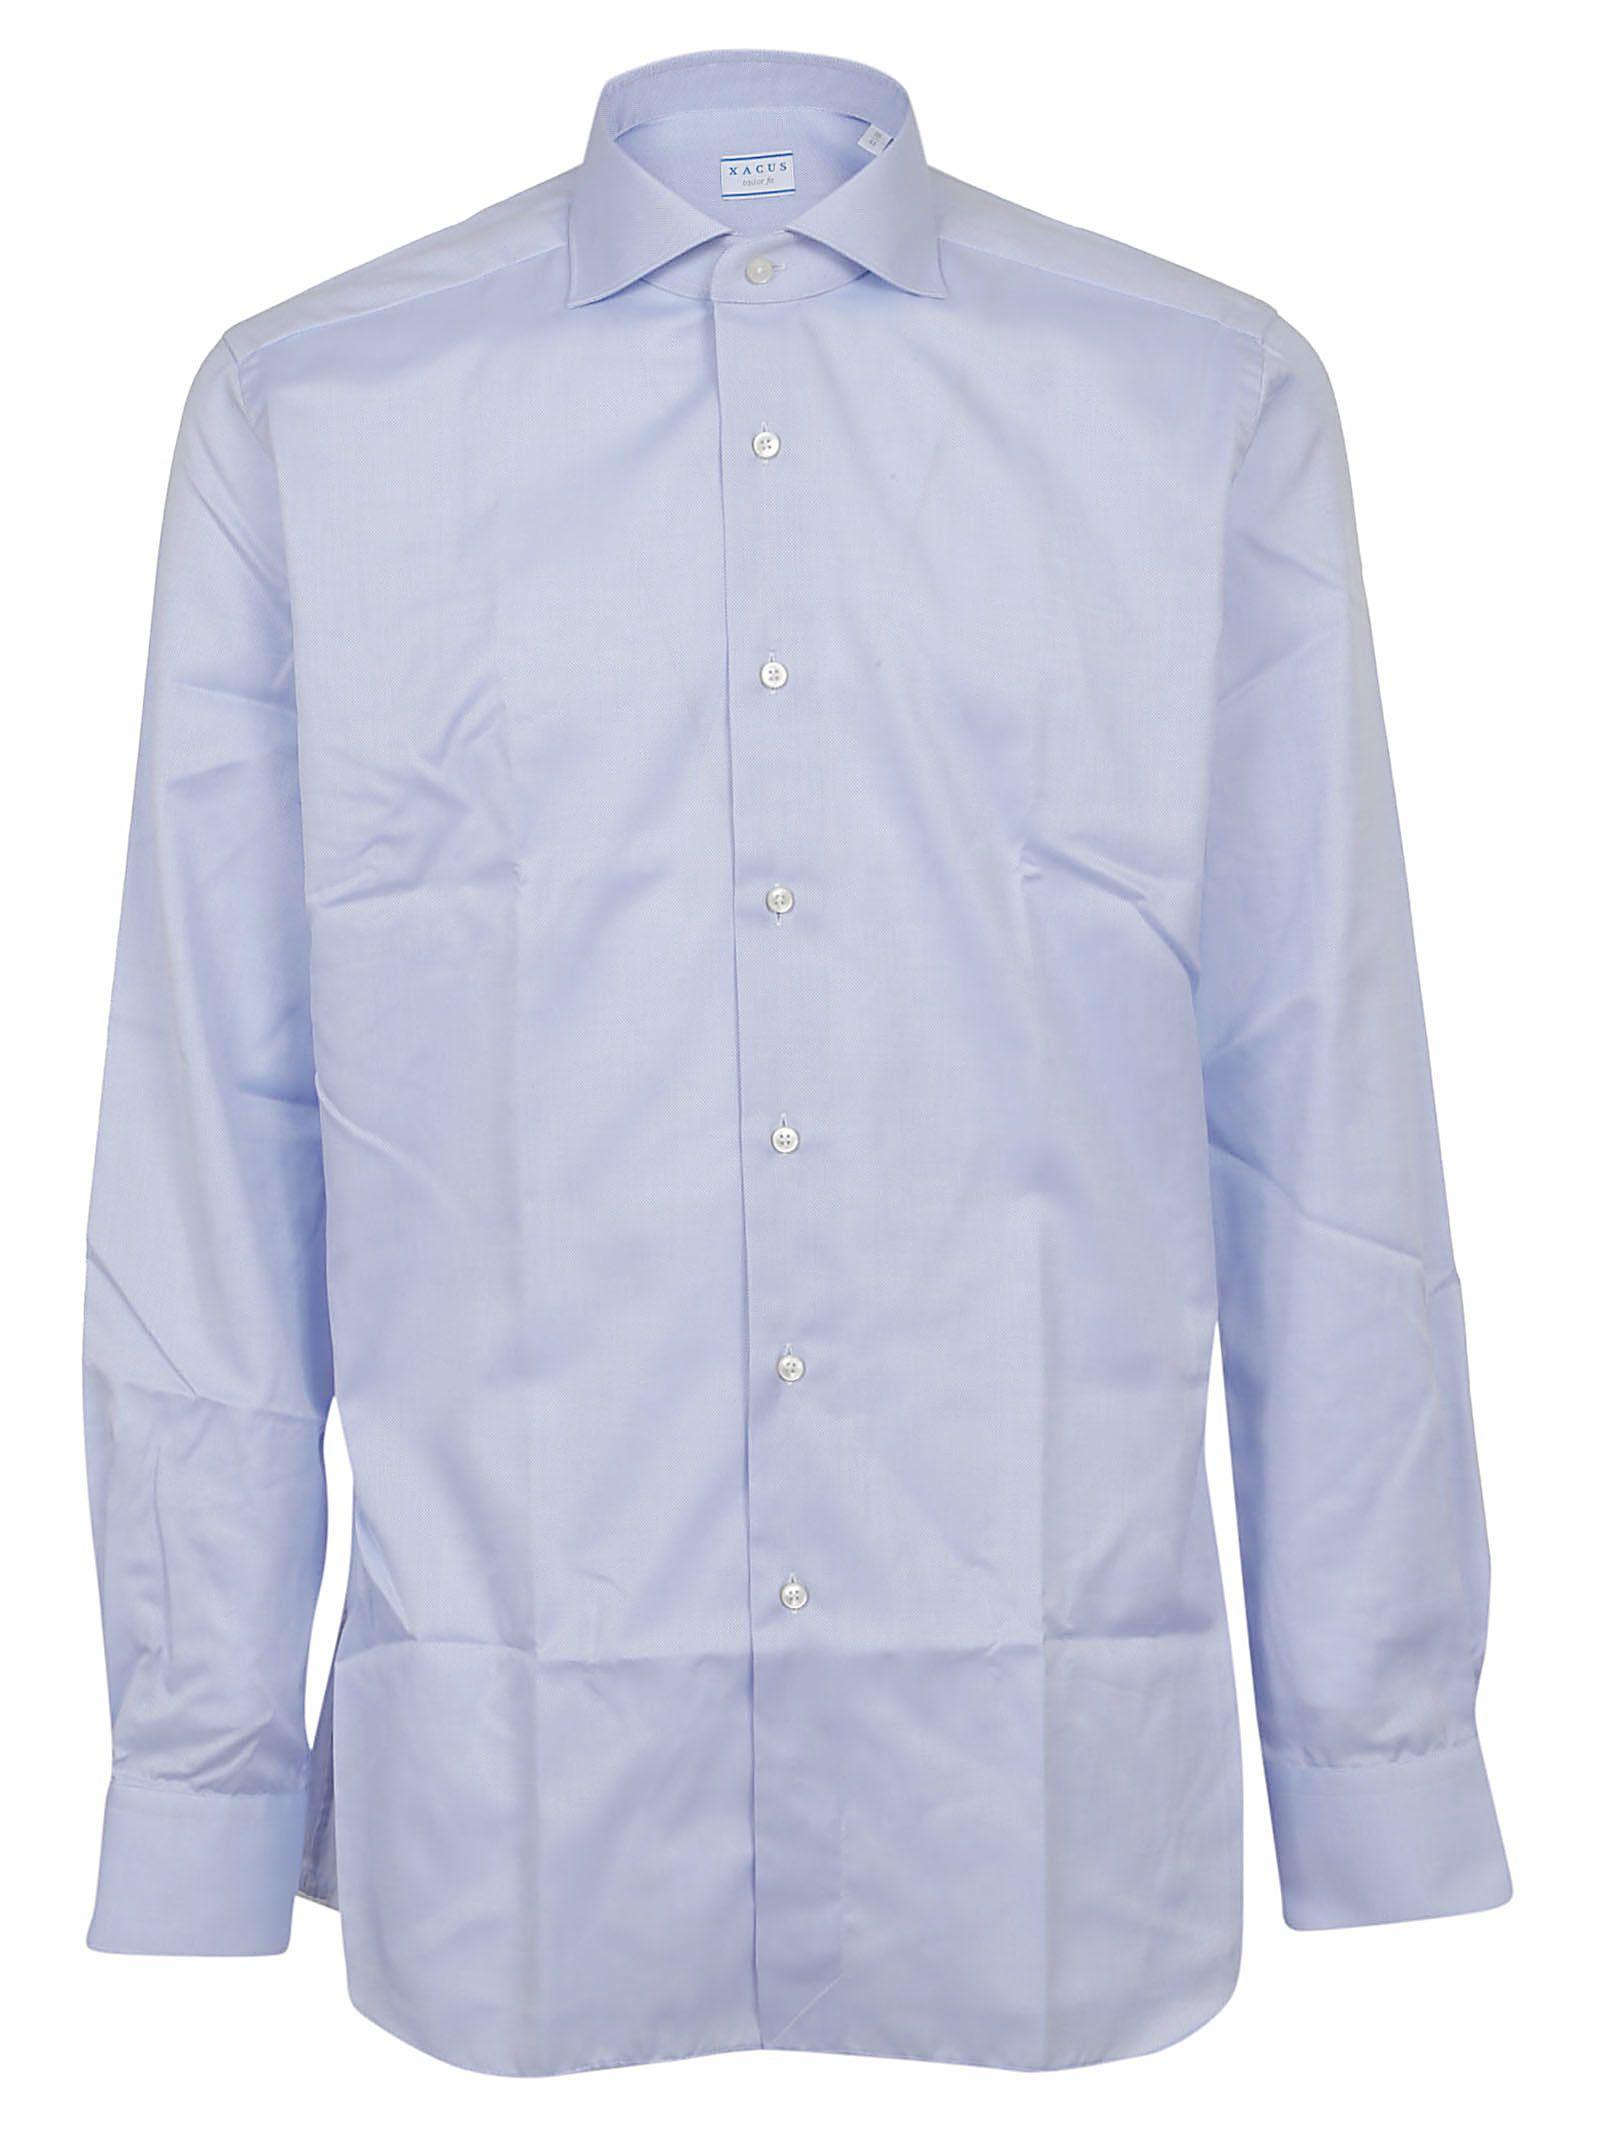 XACUS Textured Button Shirt in 002